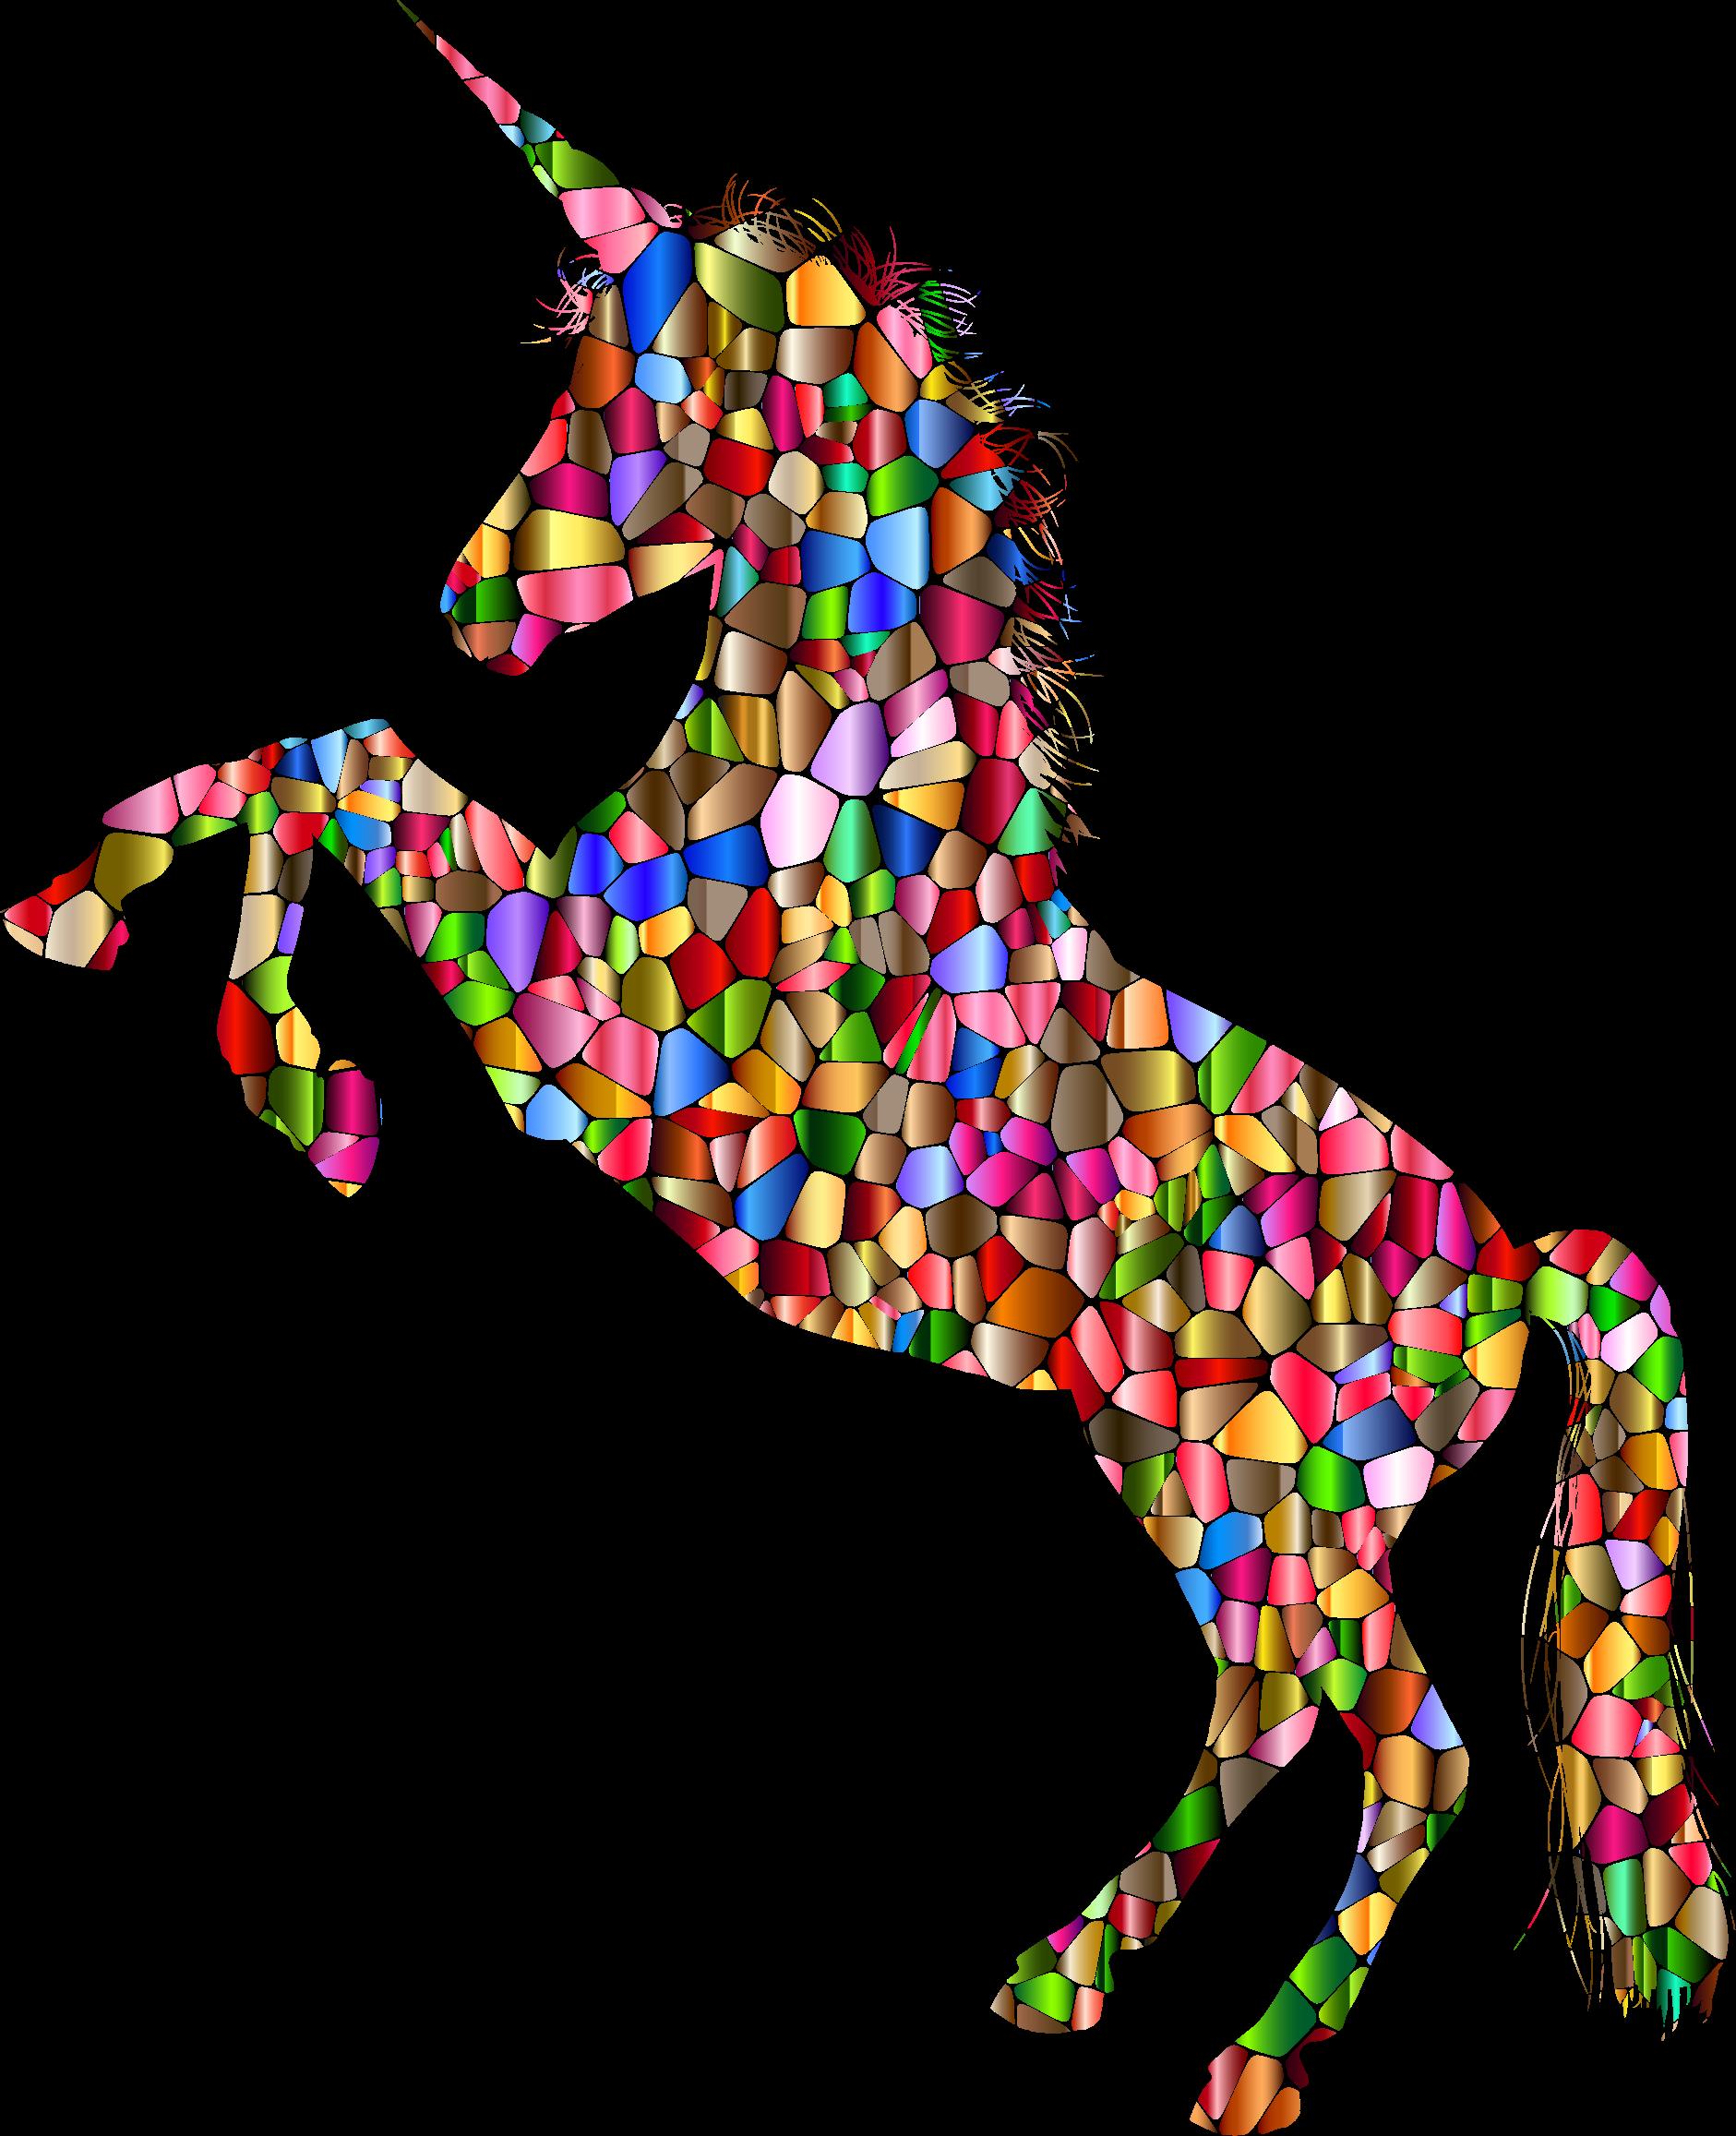 Clipart rainbow unicorns. Vibrant chromatic unicorn silhouette